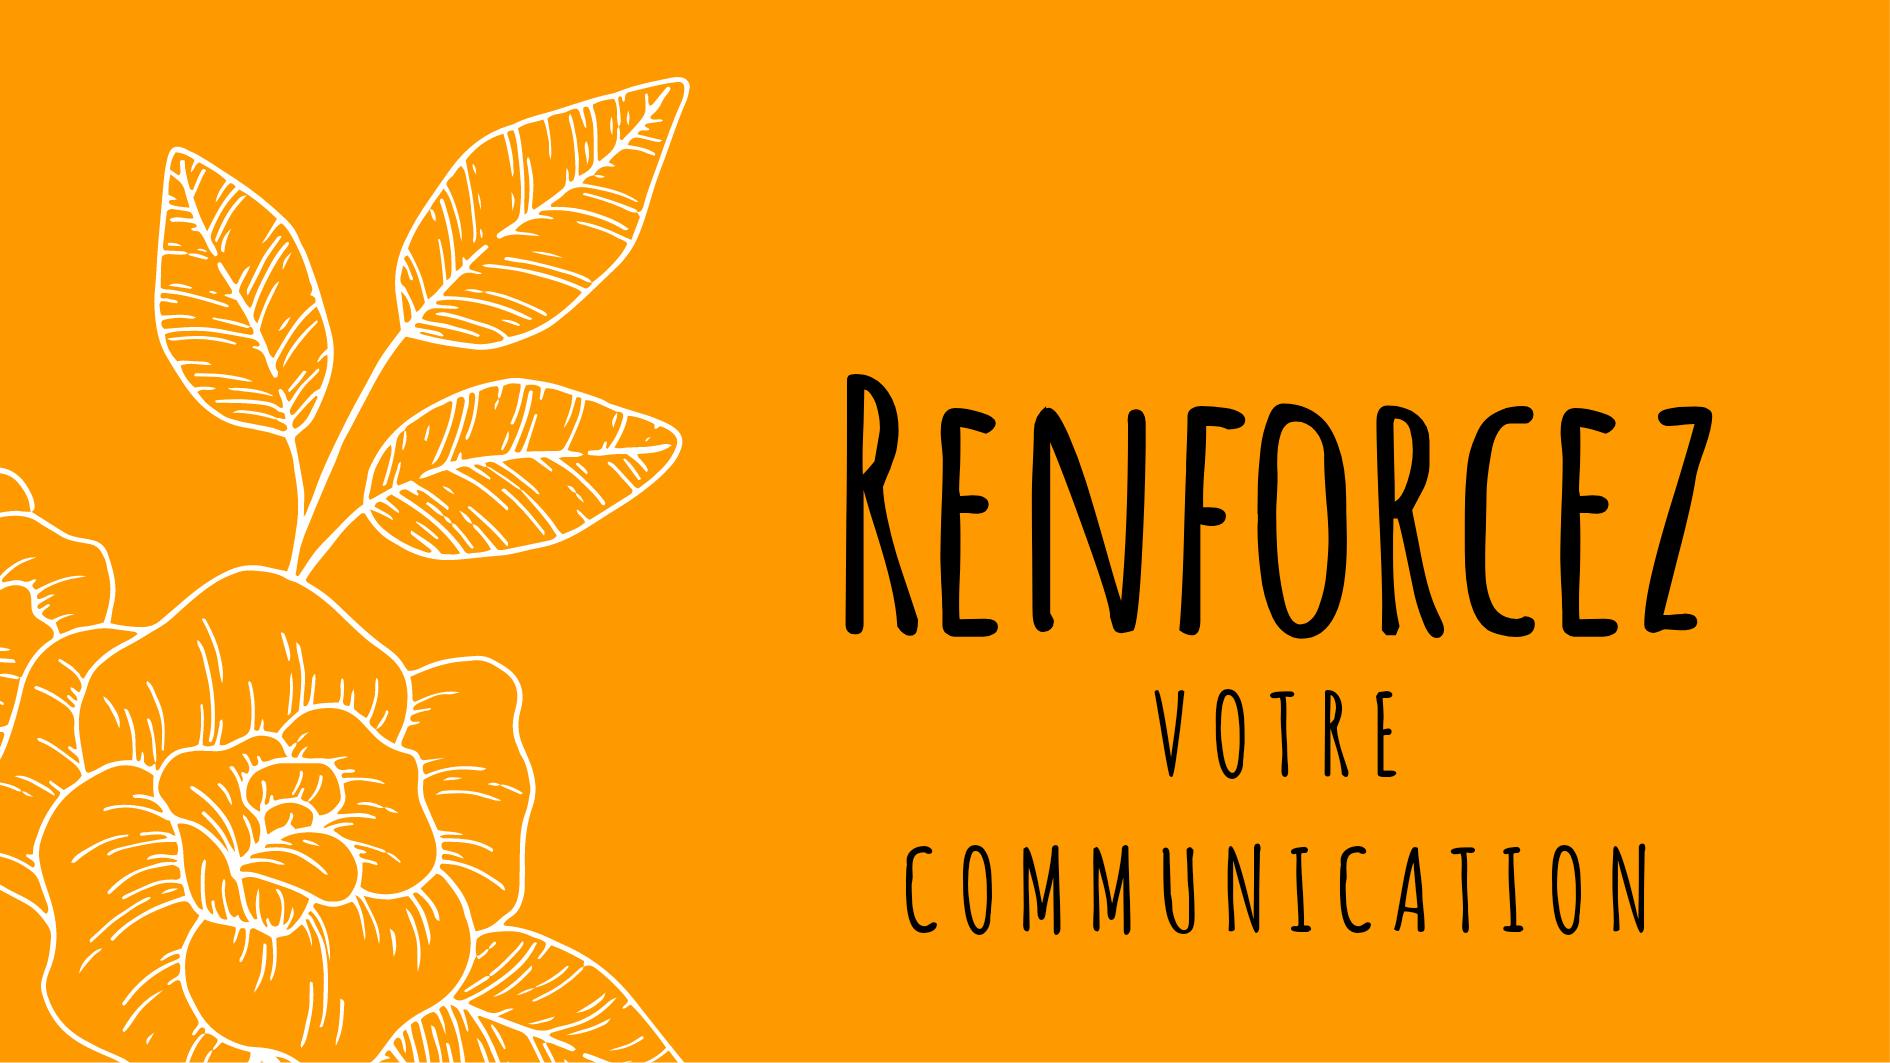 Partenariat Fiertile - Renforcez